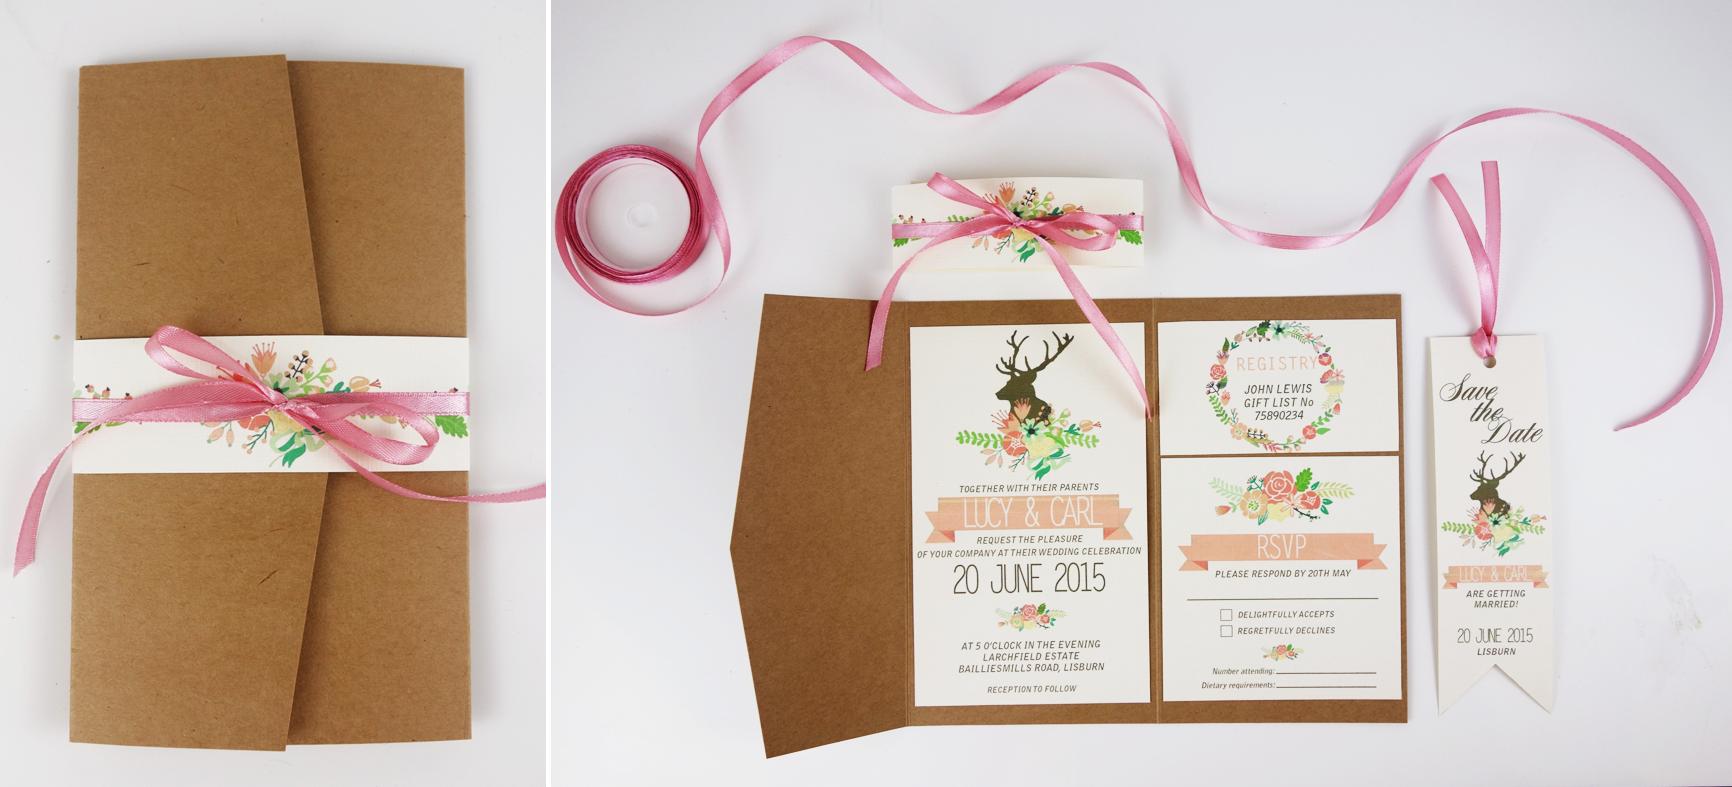 Diy Free Rustic Flowery Wedding Invite Template Wedding Invitations Wedding Favors Wedding